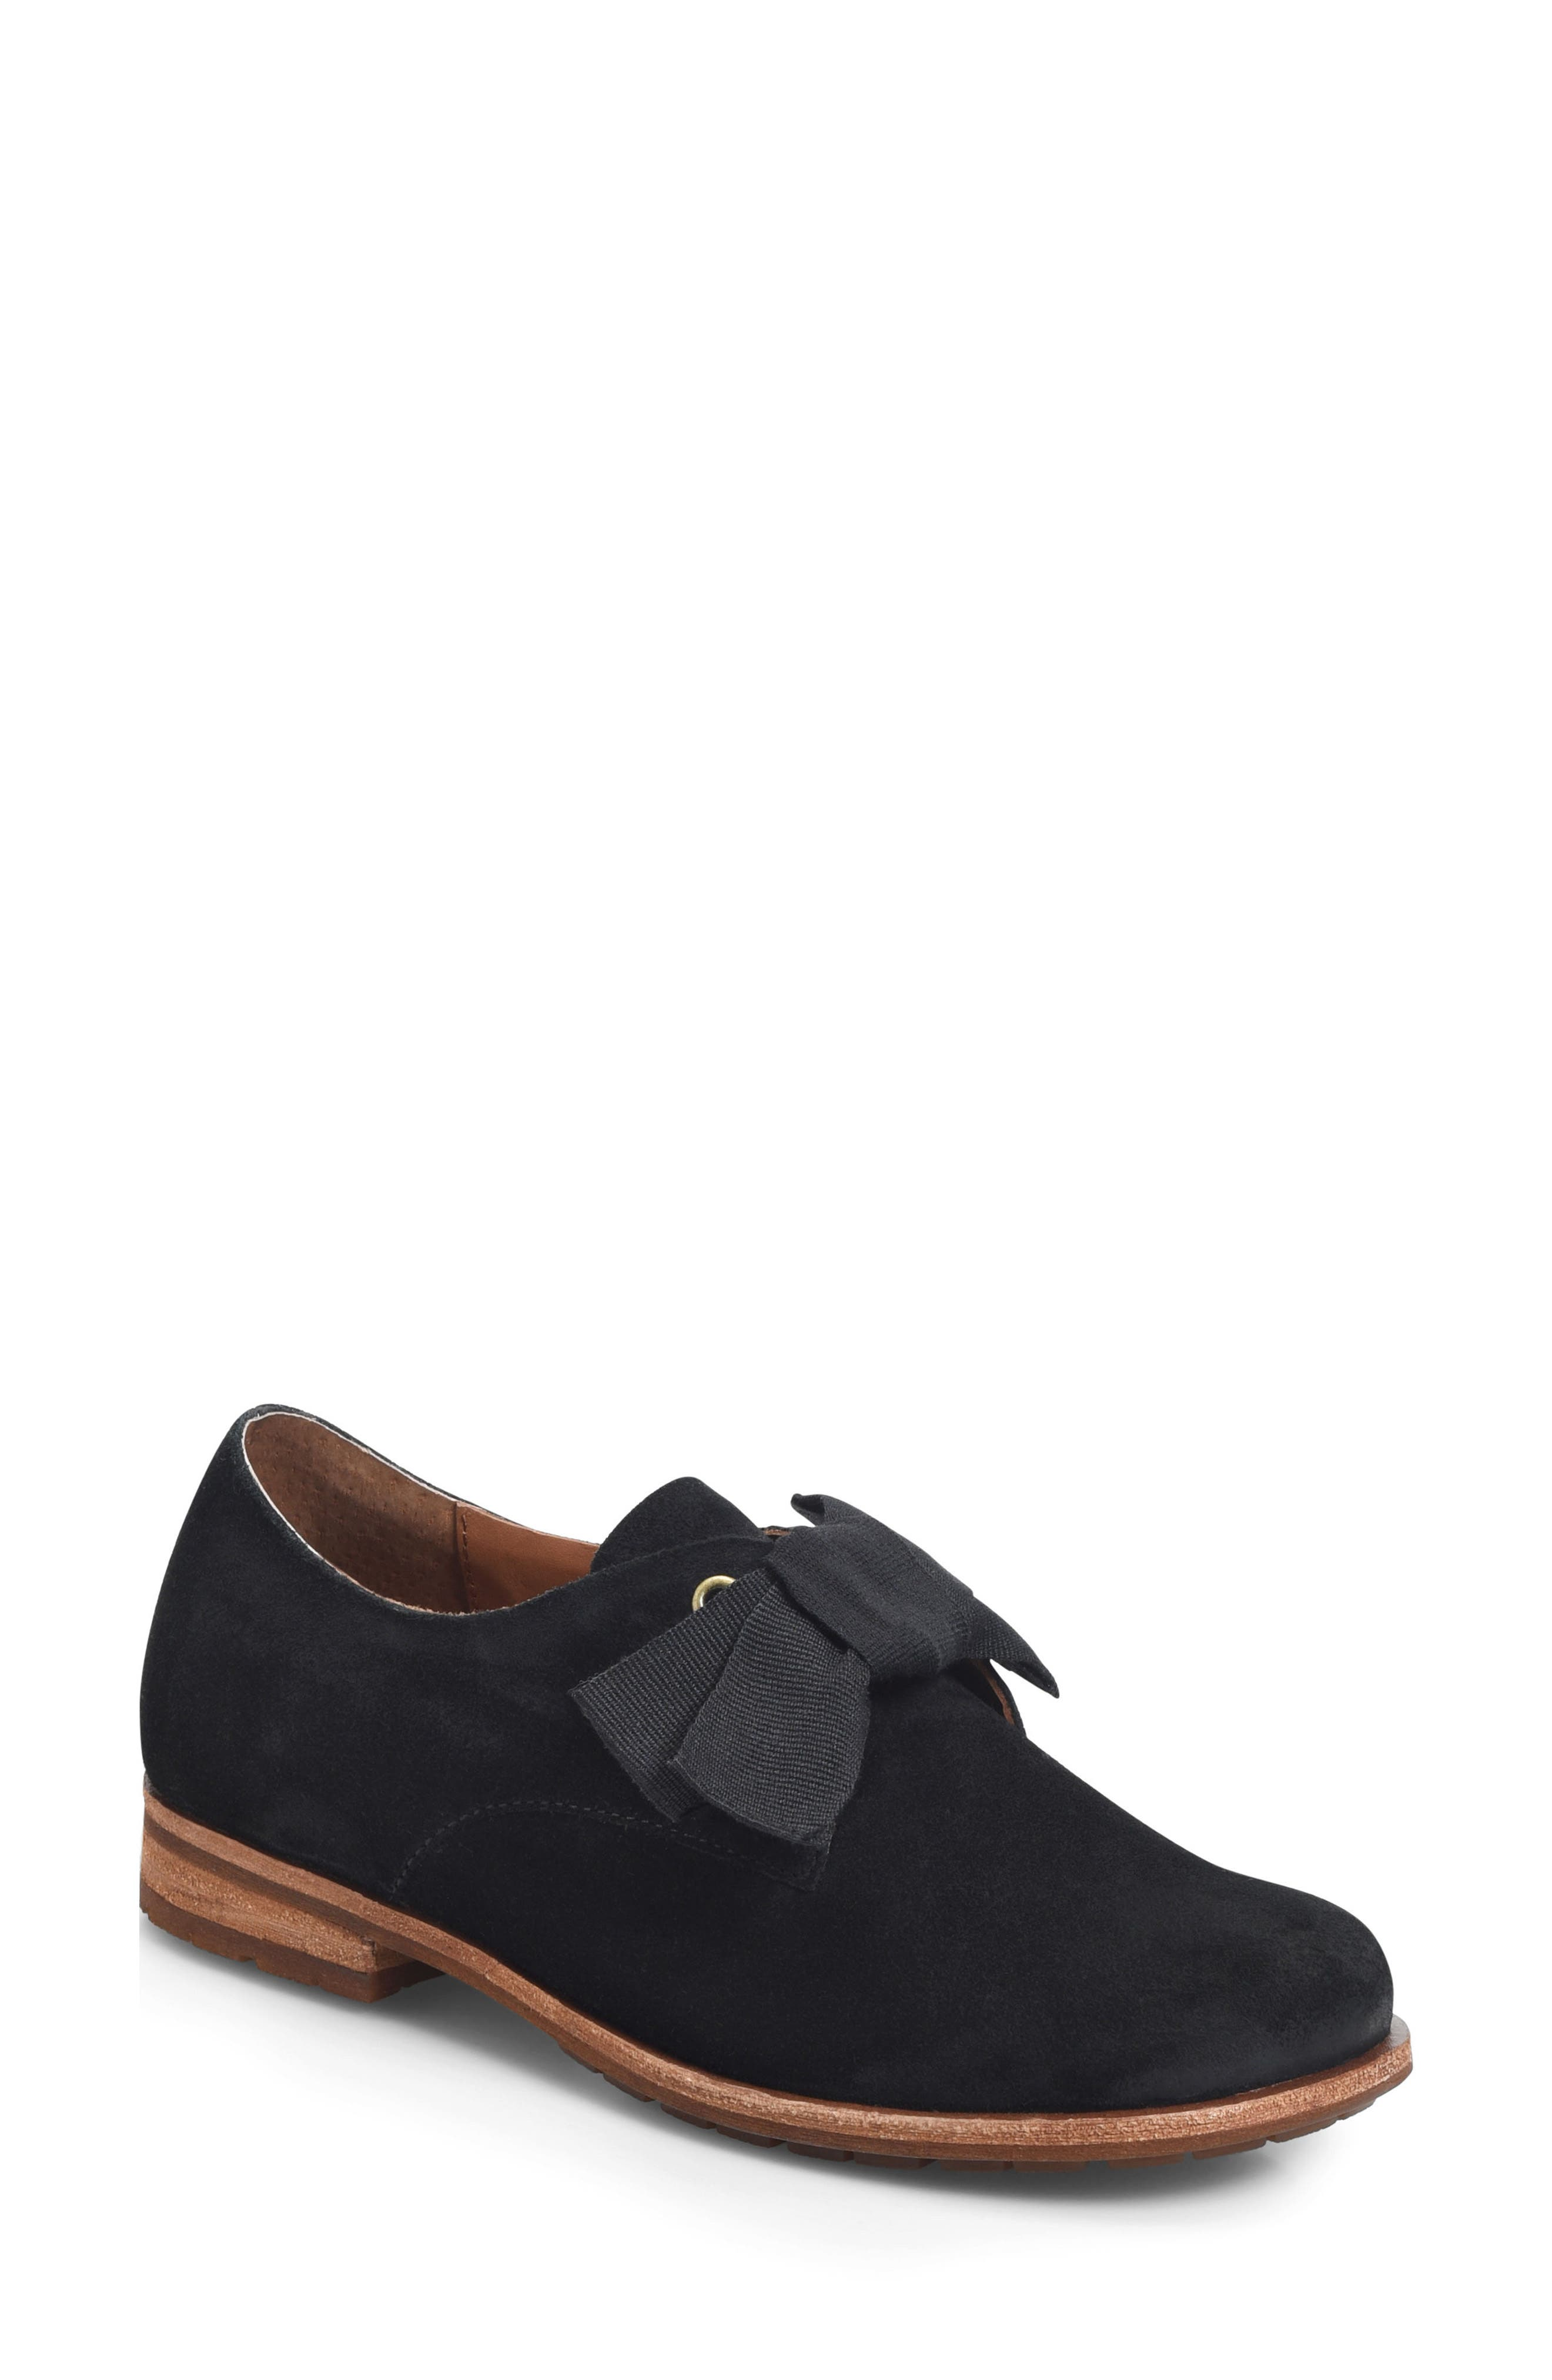 Kork-Ease Beryl Bow Flat, Black